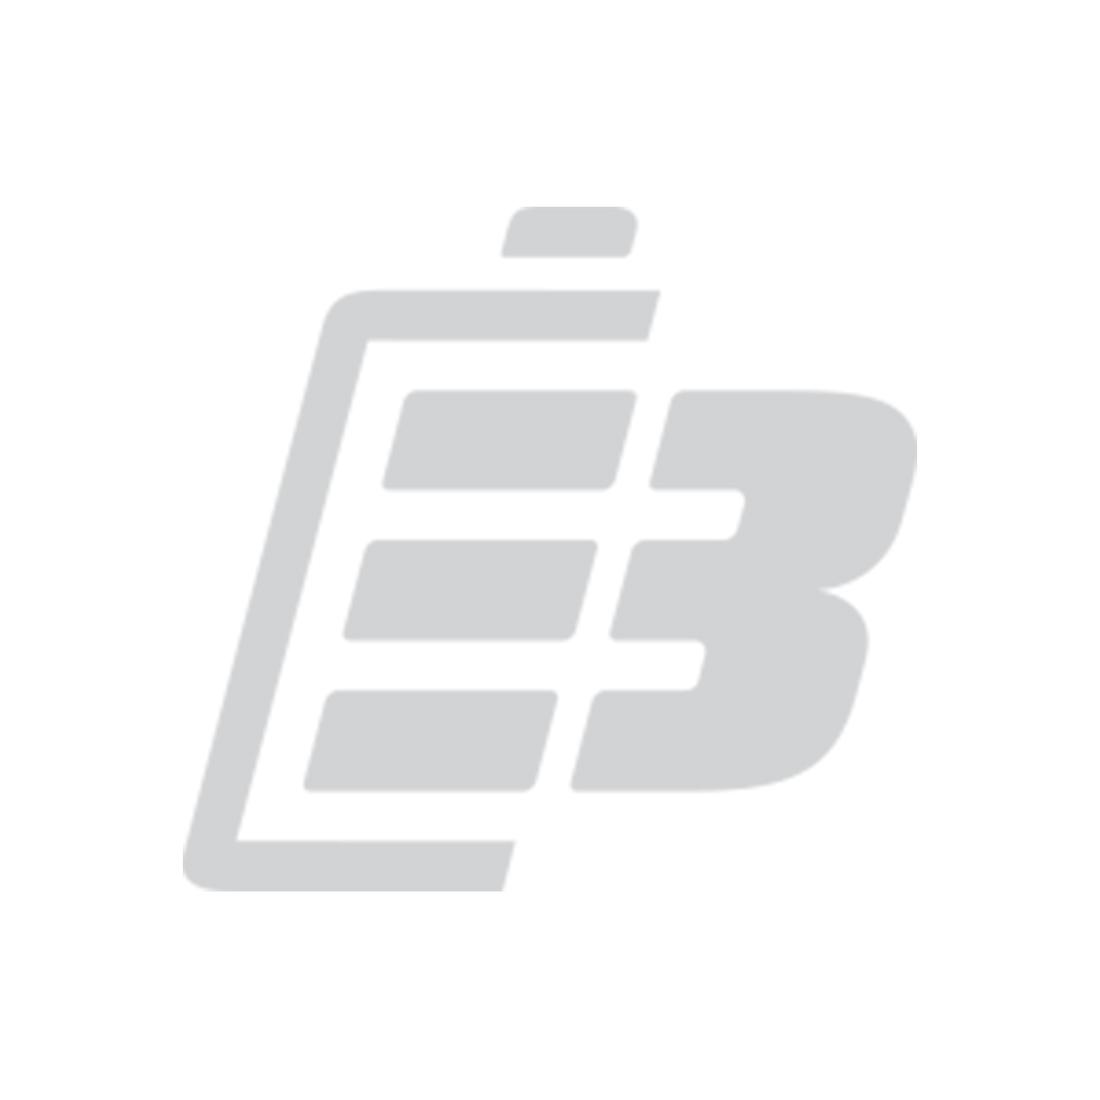 Smartphone battery ZTE Blade L110_1